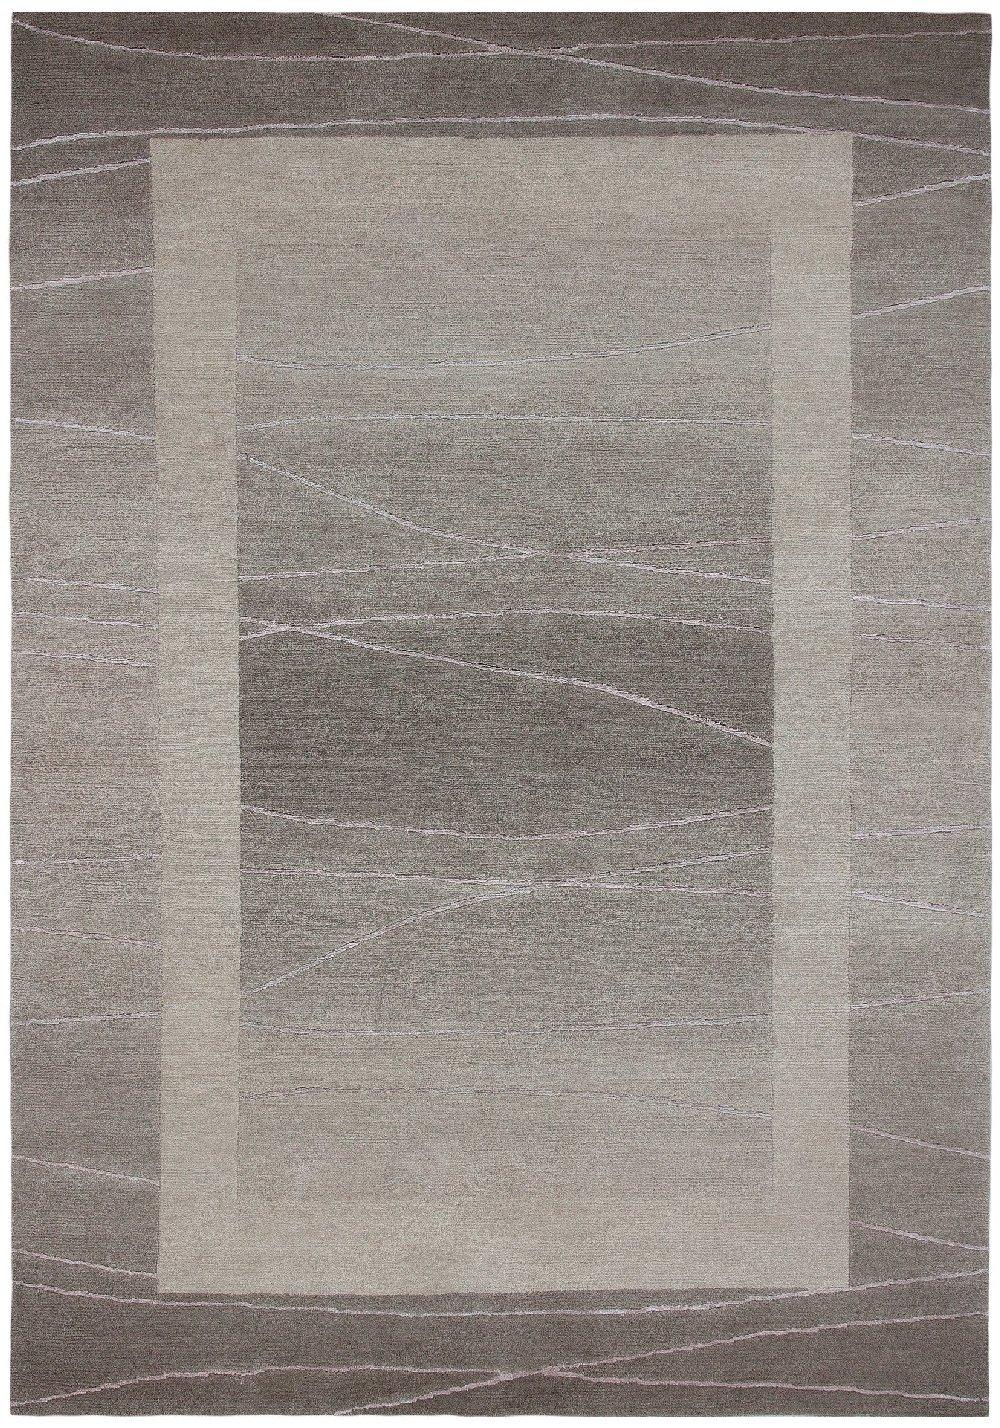 Sona-Lux Nepal Teppich handgeknüpft sand